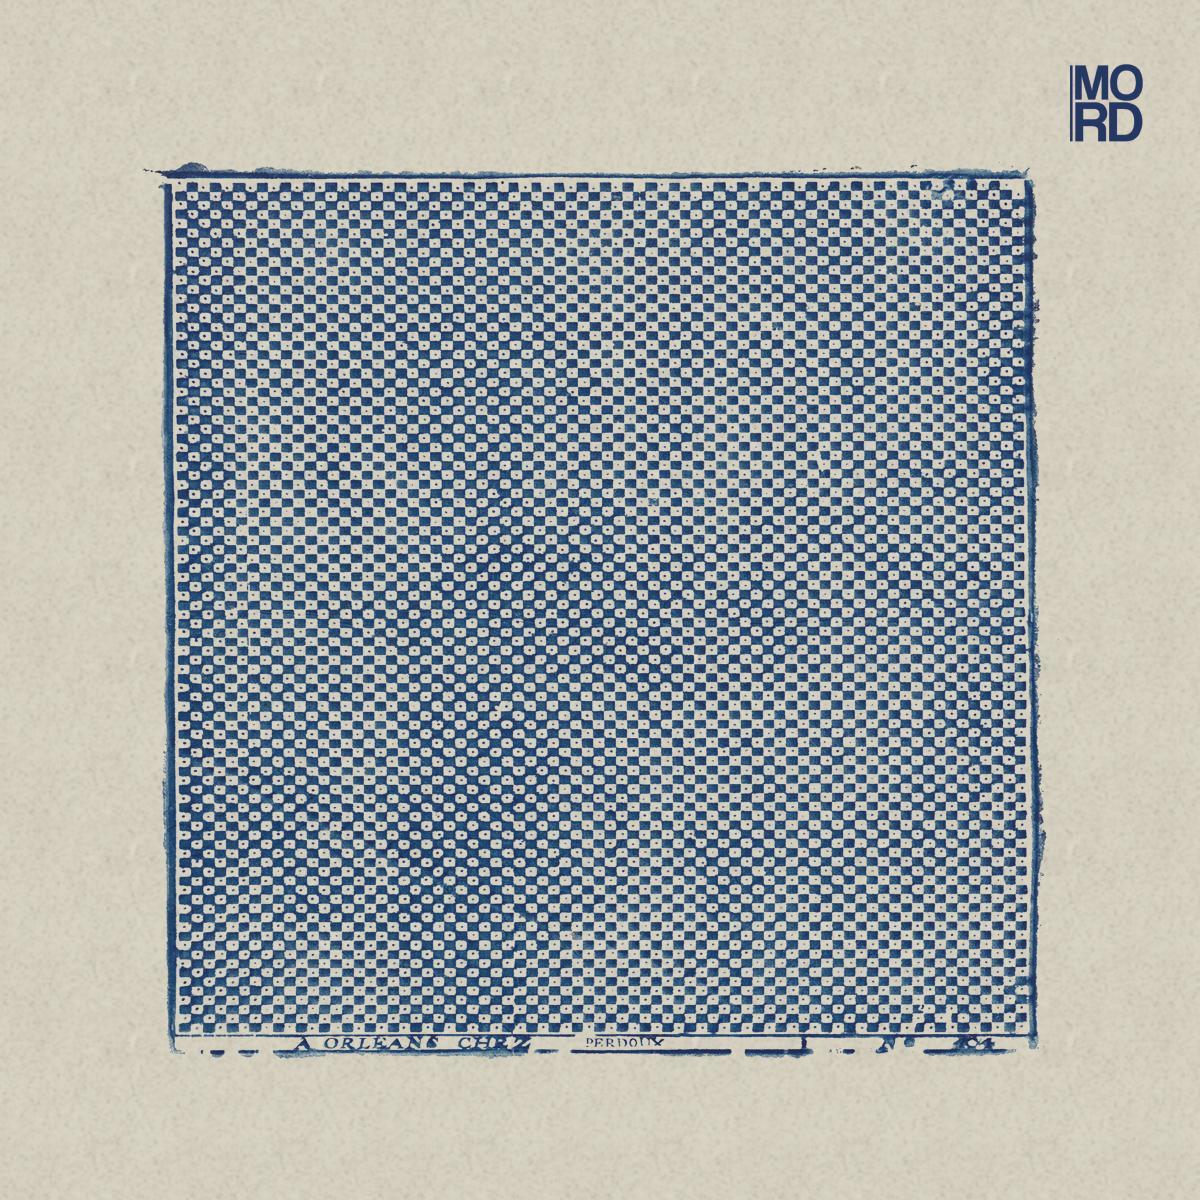 "Endlec/ROTTEN NATION EP 12"""